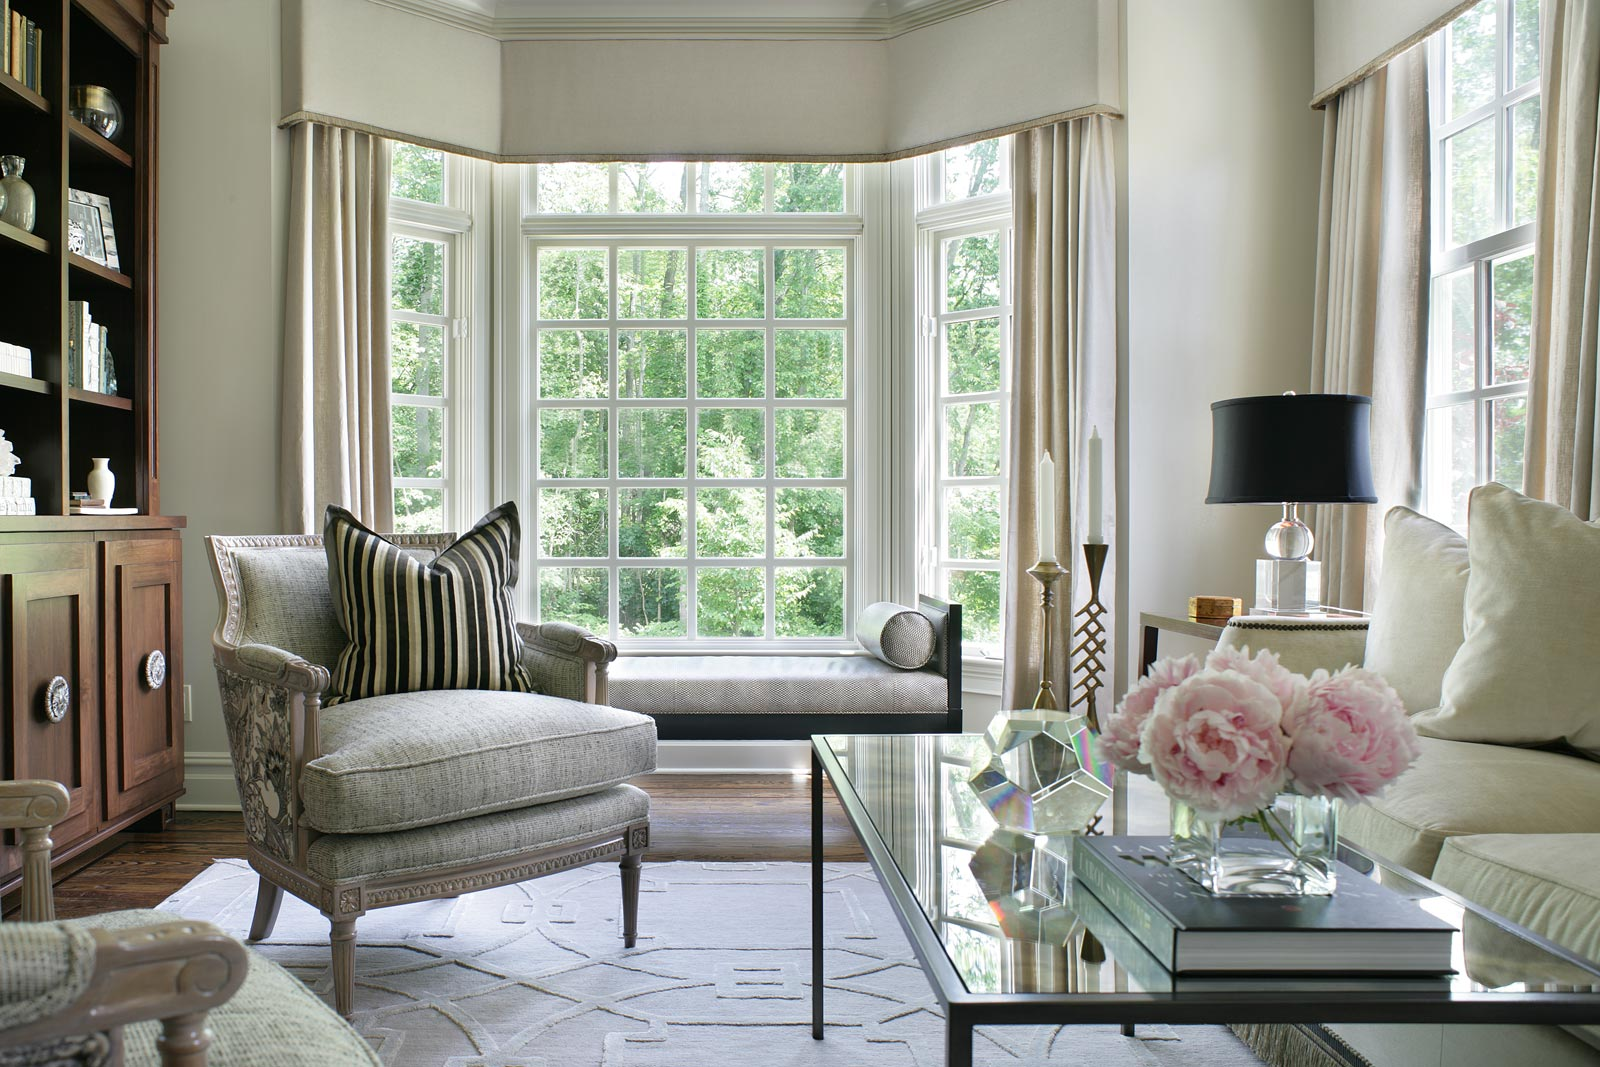 Chatham Bedroom Furniture